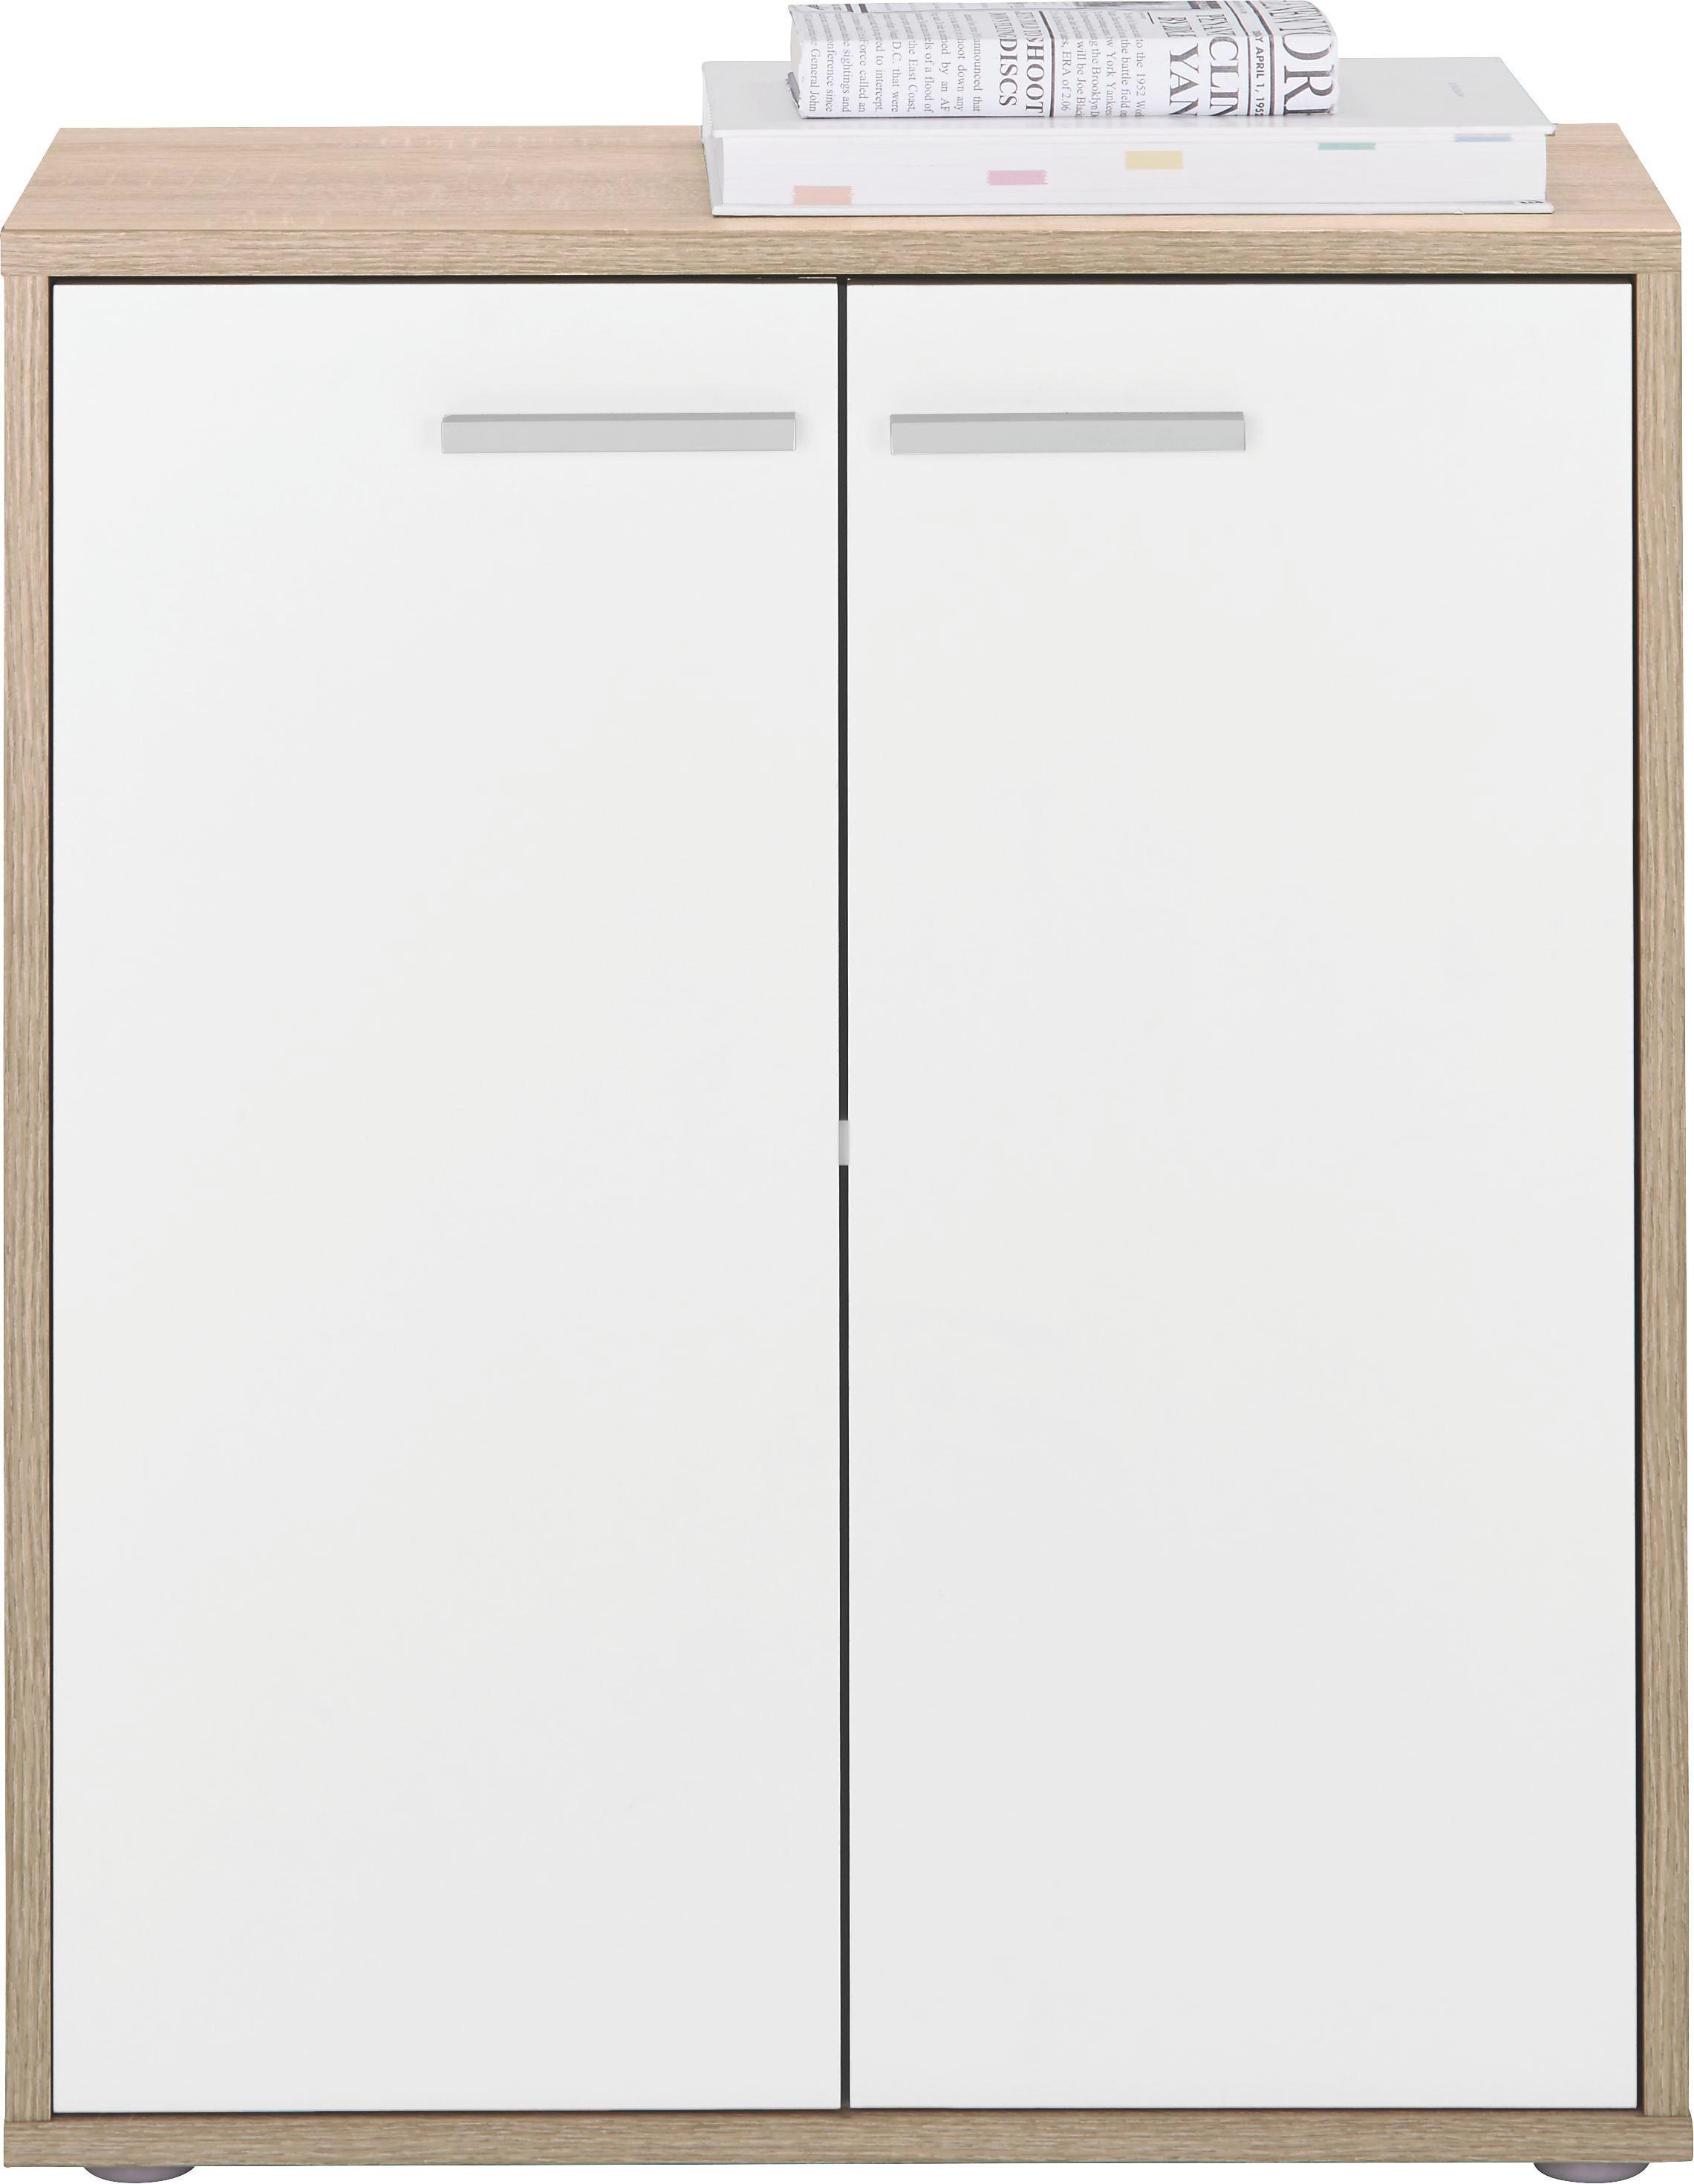 Komoda Andrea - bílá/Sonoma dub, dřevěný materiál (60/70/30cm)